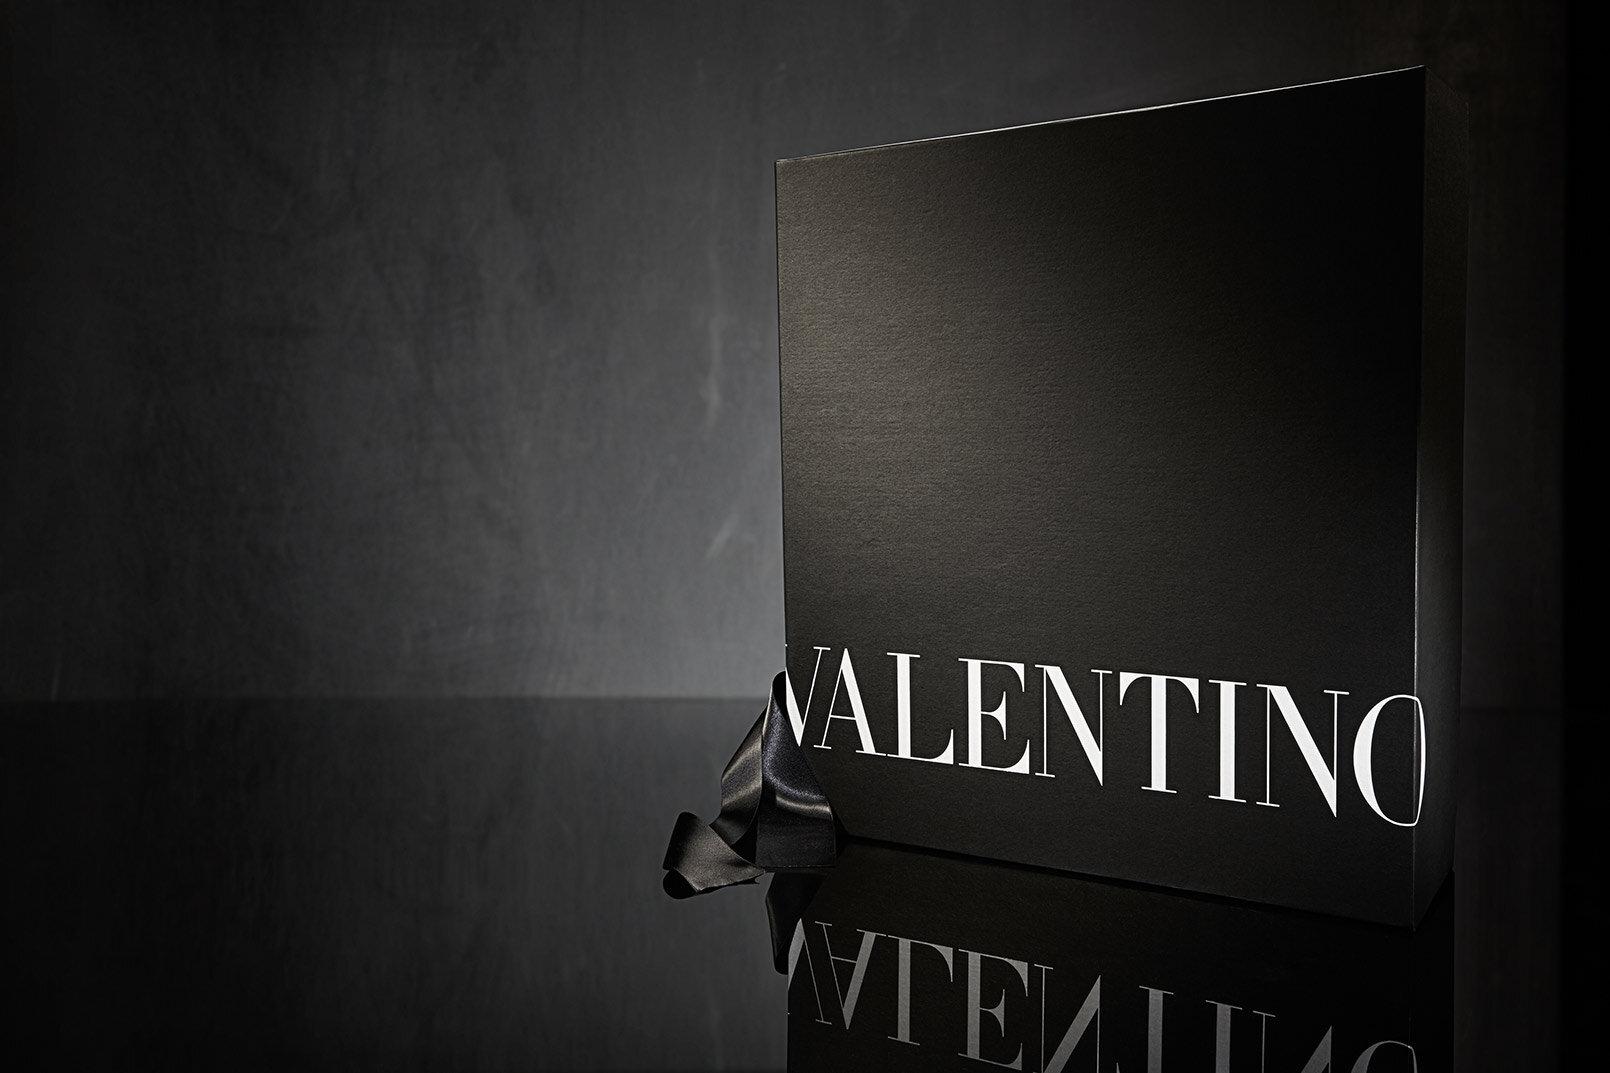 Valentino-box-design-packaging-company-1.jpg